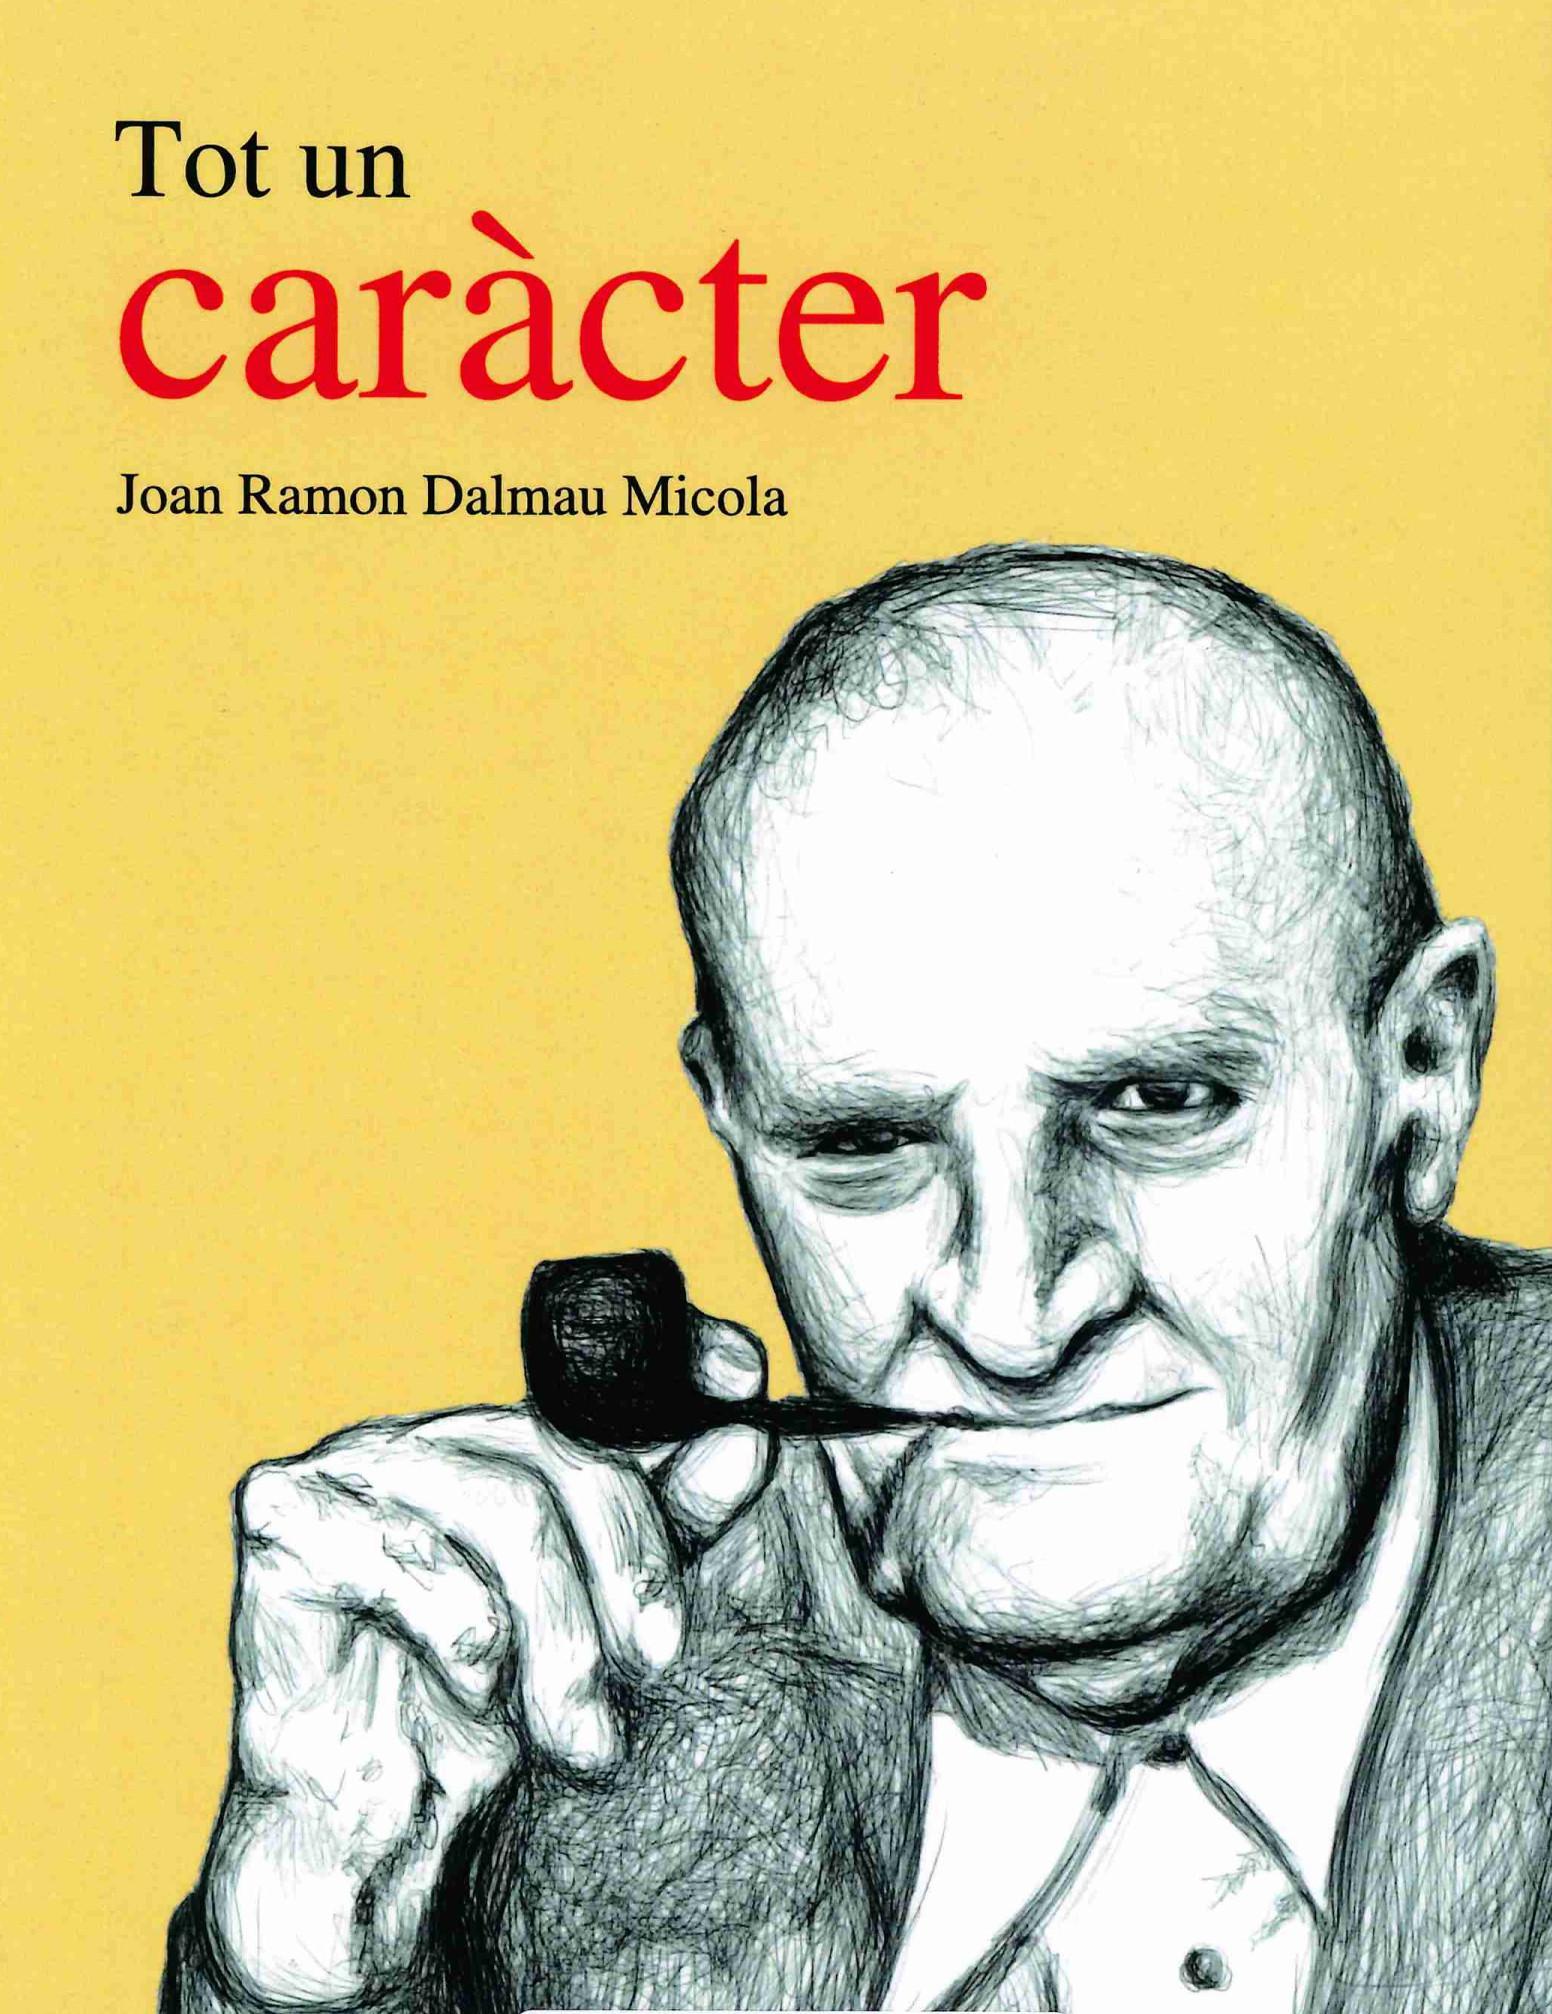 Presentació llibre Joan Ramon Dalmau Micola